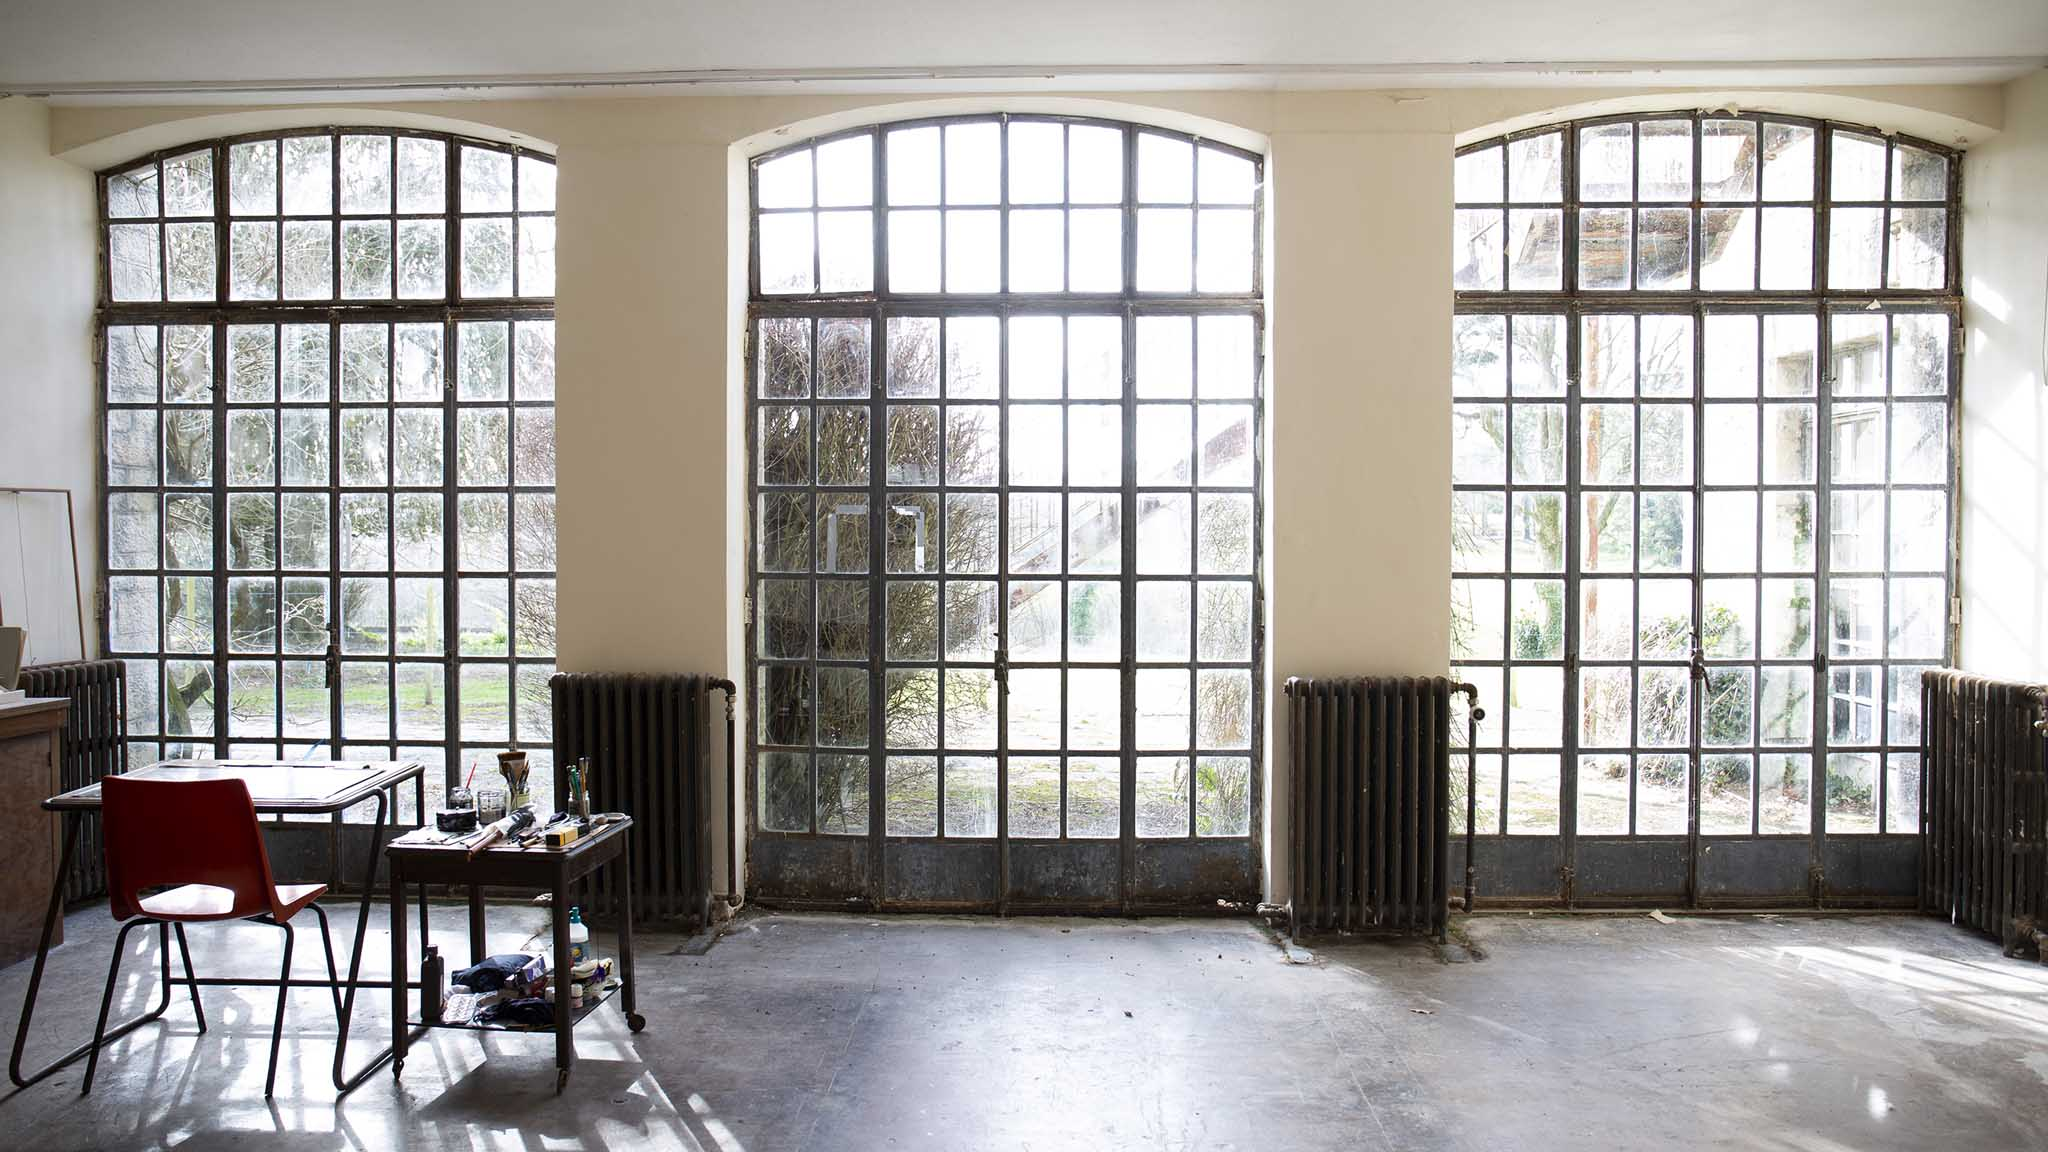 Cutting-edge new arts programme in former Dartington Hall school building